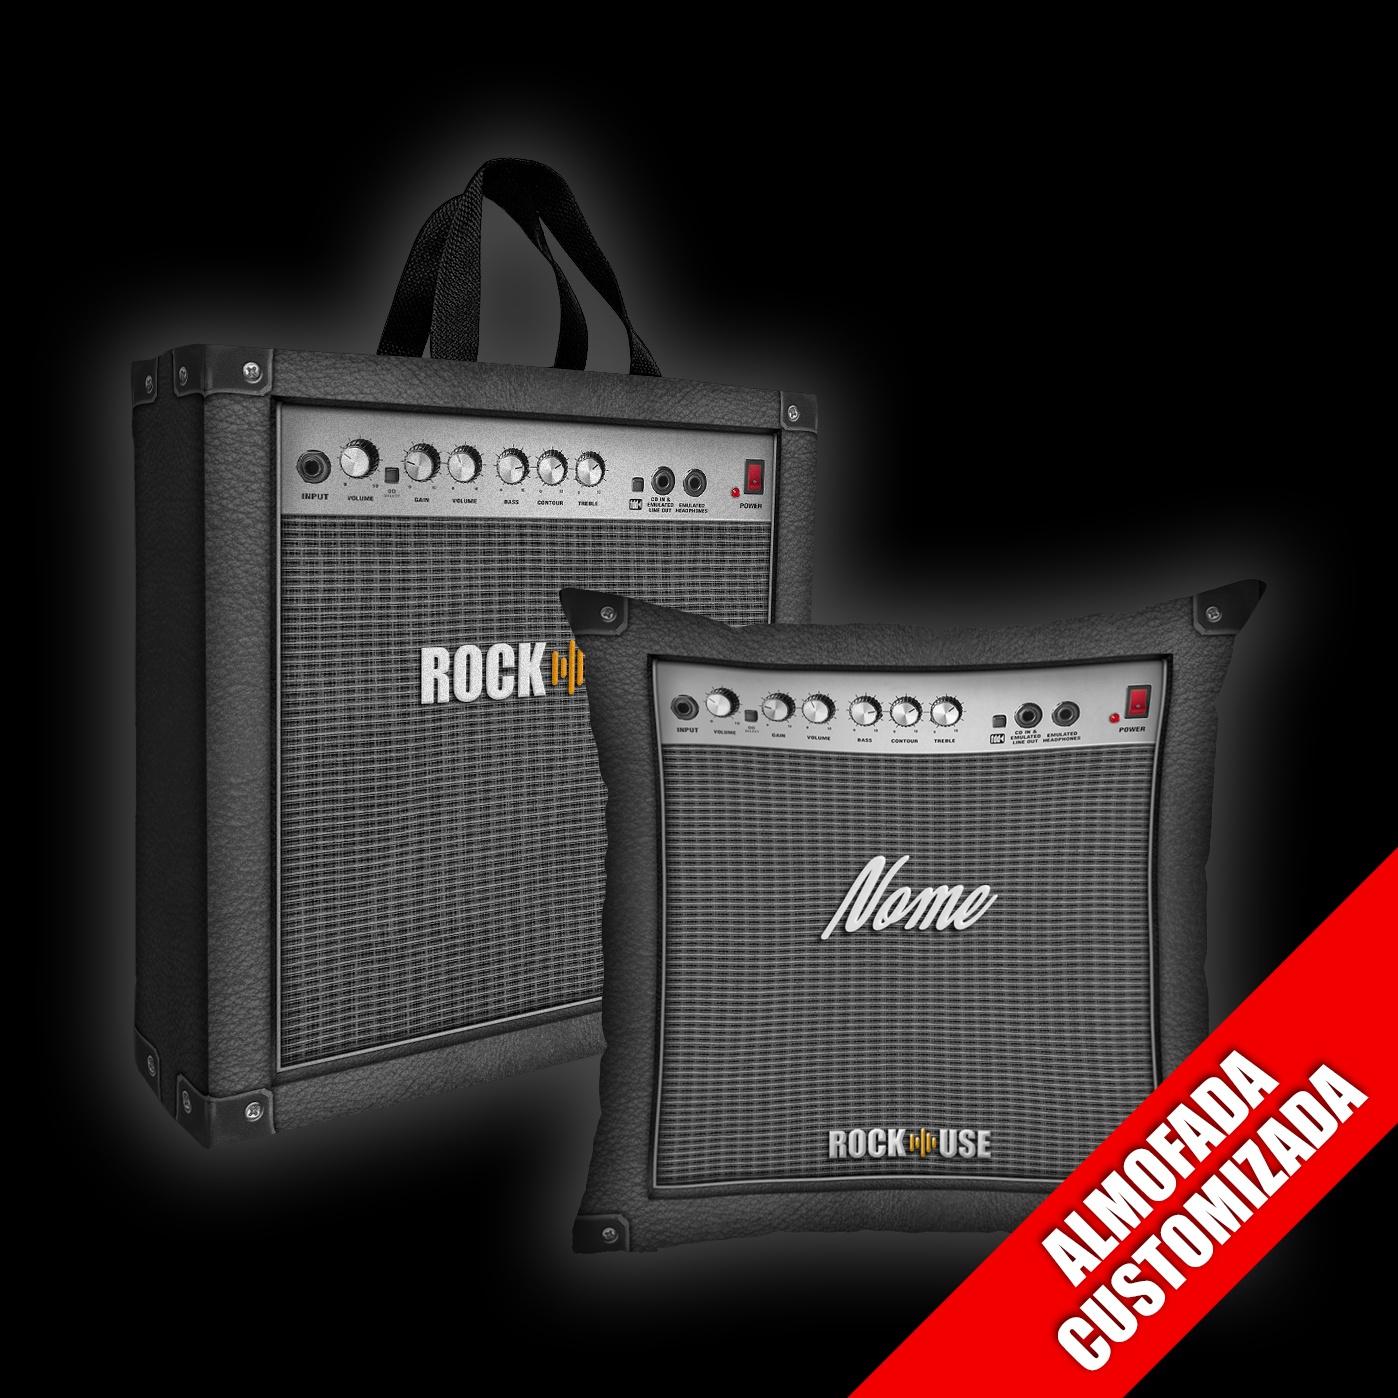 Kit Almofada Personalizada + Sacola Rock Use